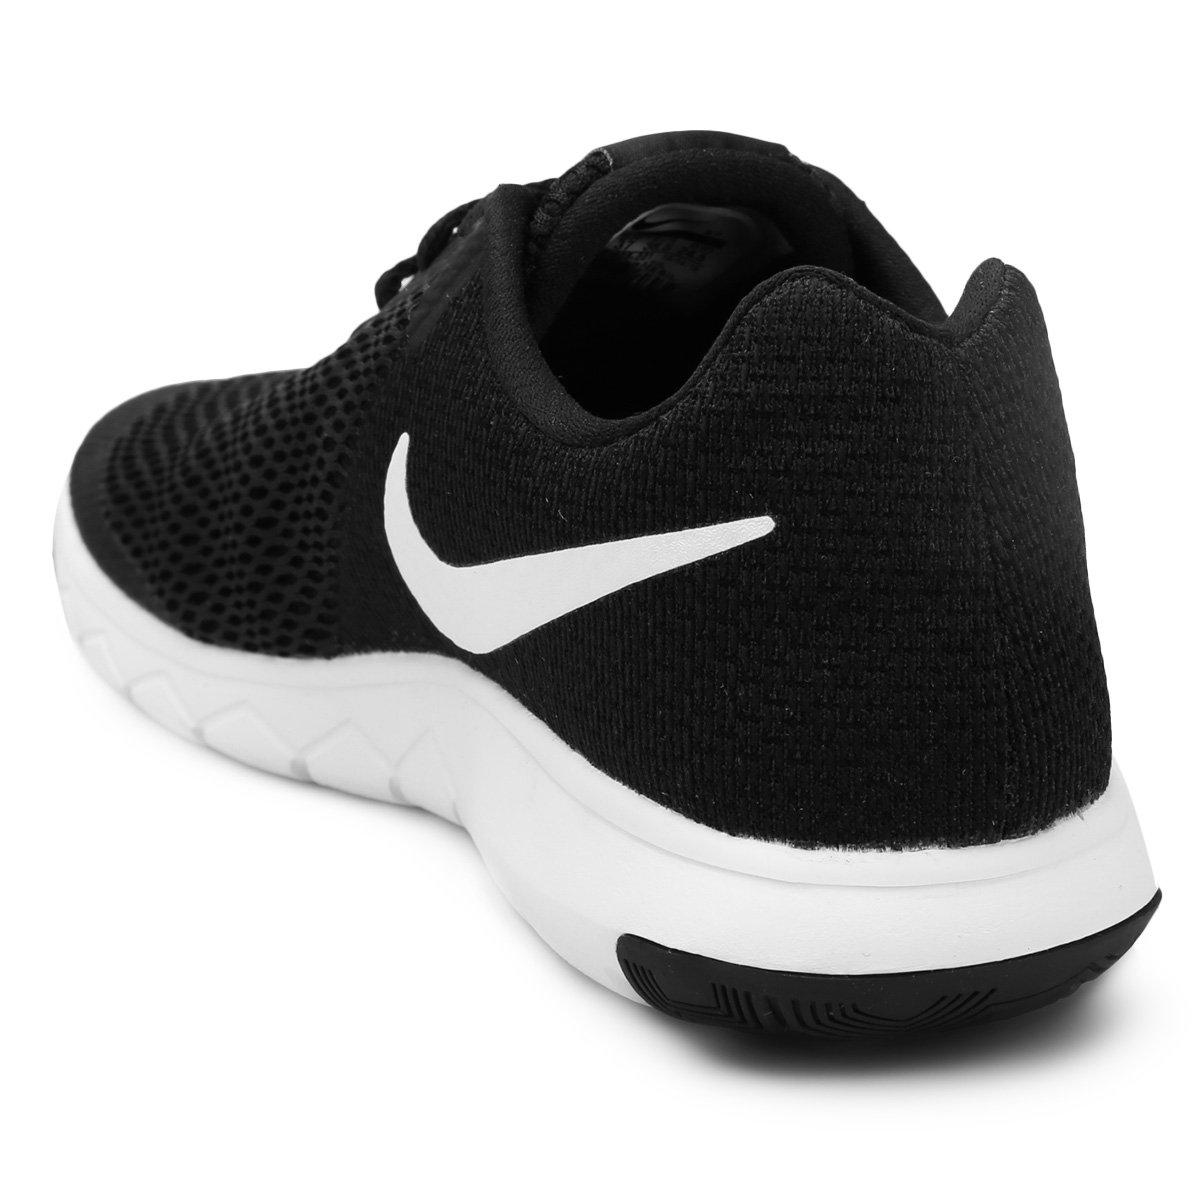 Tênis Nike Flex Experience Rn 6 Feminino - Preto e Branco - Compre ... e560845e85d77